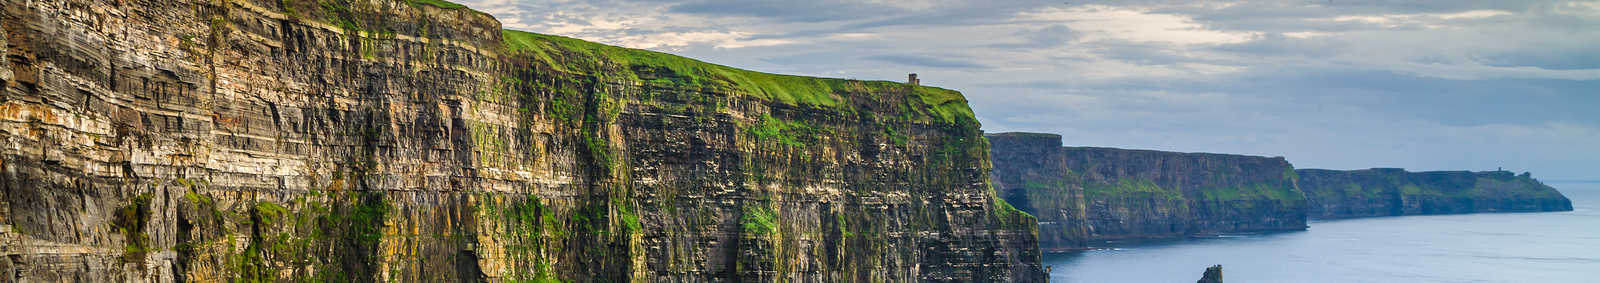 world famous landscape from west coast of ireland. wild atlantic way route tourism